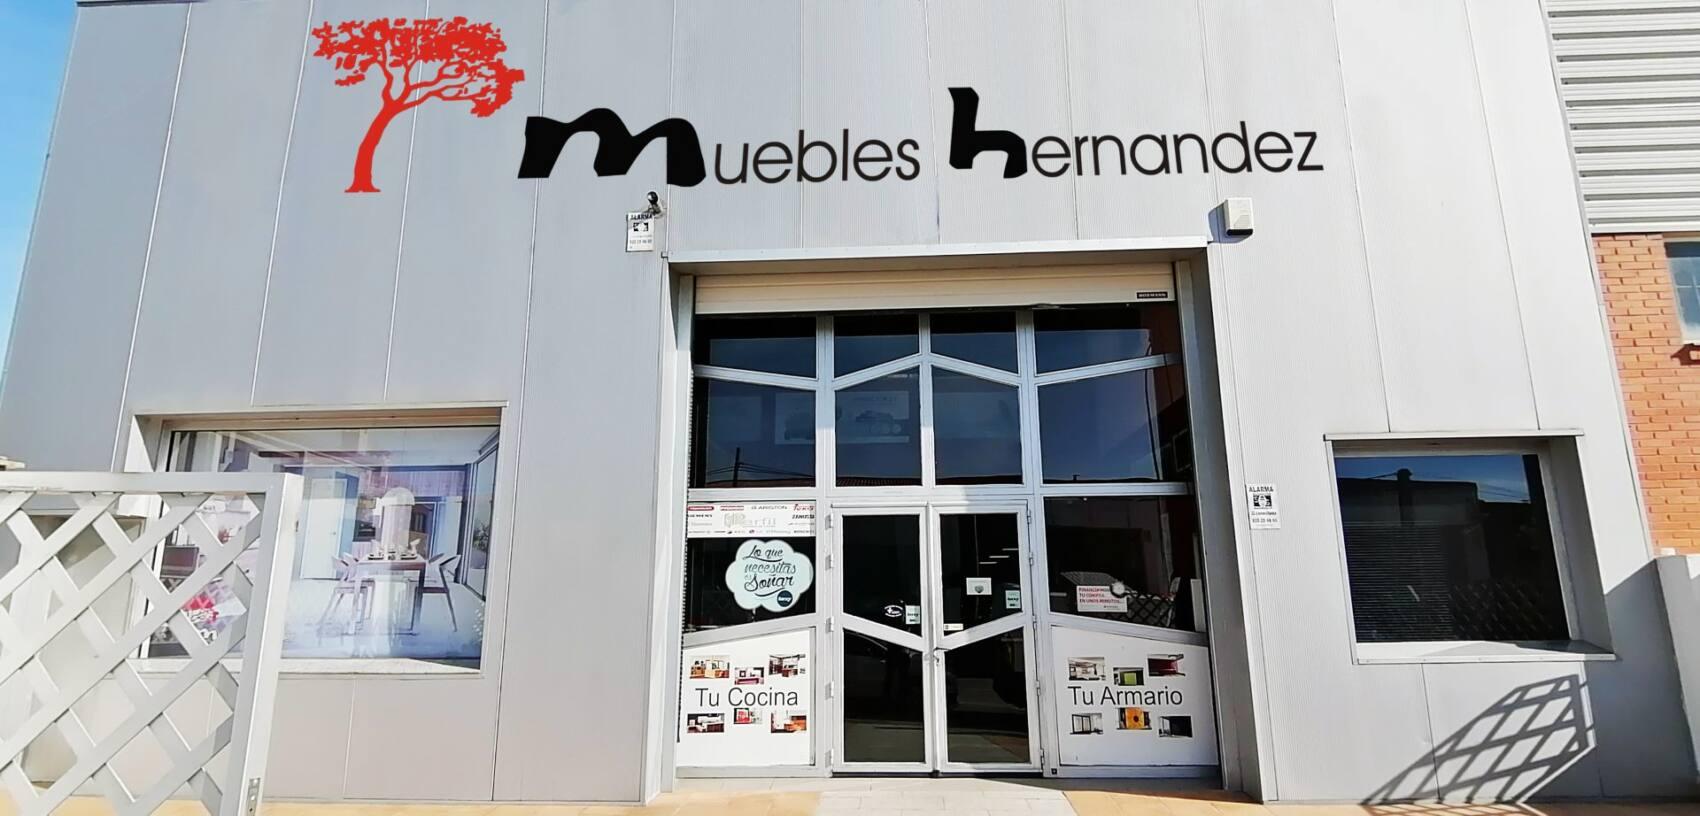 MUEBLES HERNANDEZ FACHADA